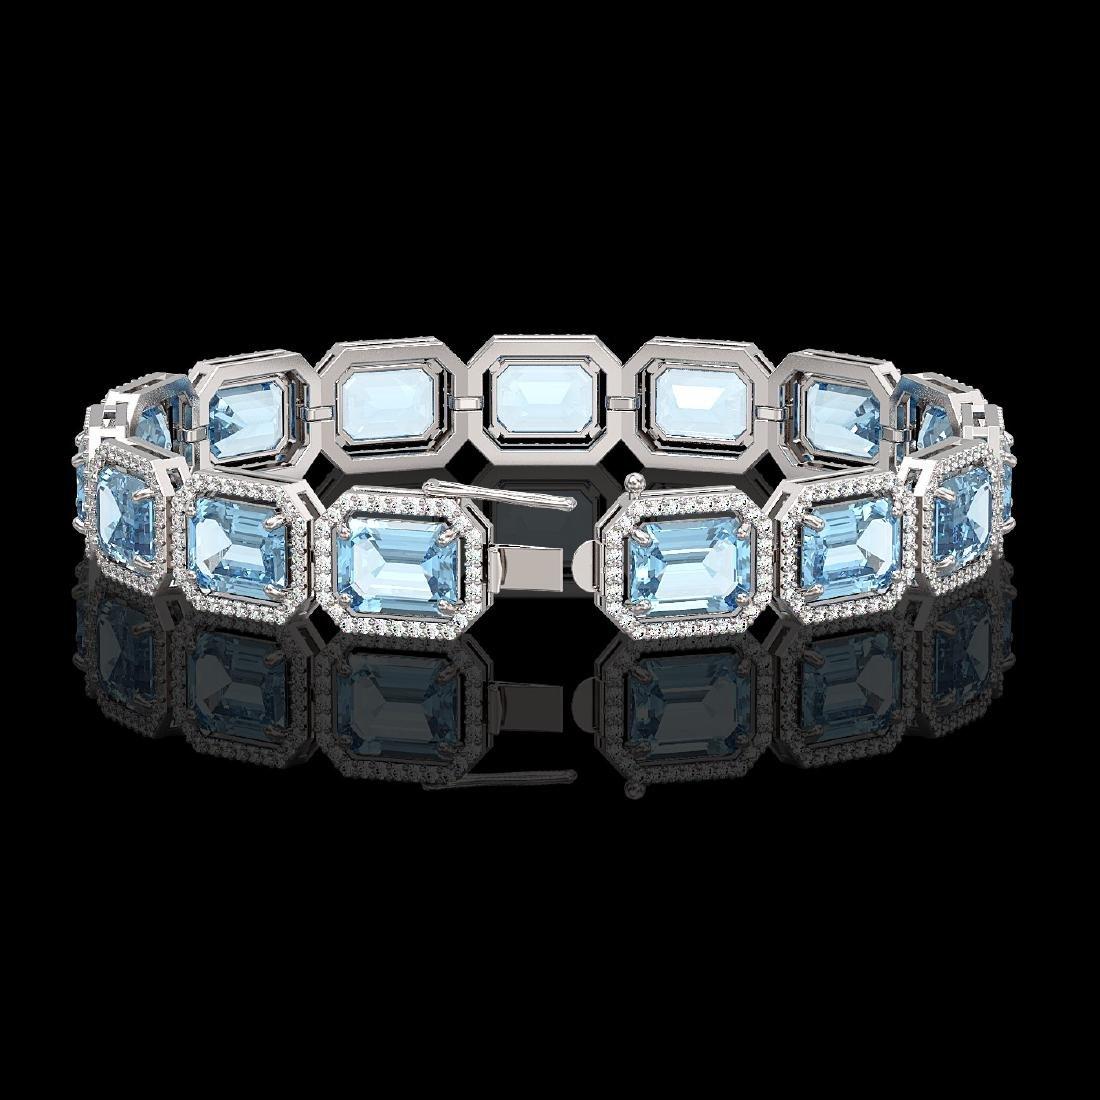 36.81 CTW Aquamarine & Diamond Halo Bracelet 10K White - 2